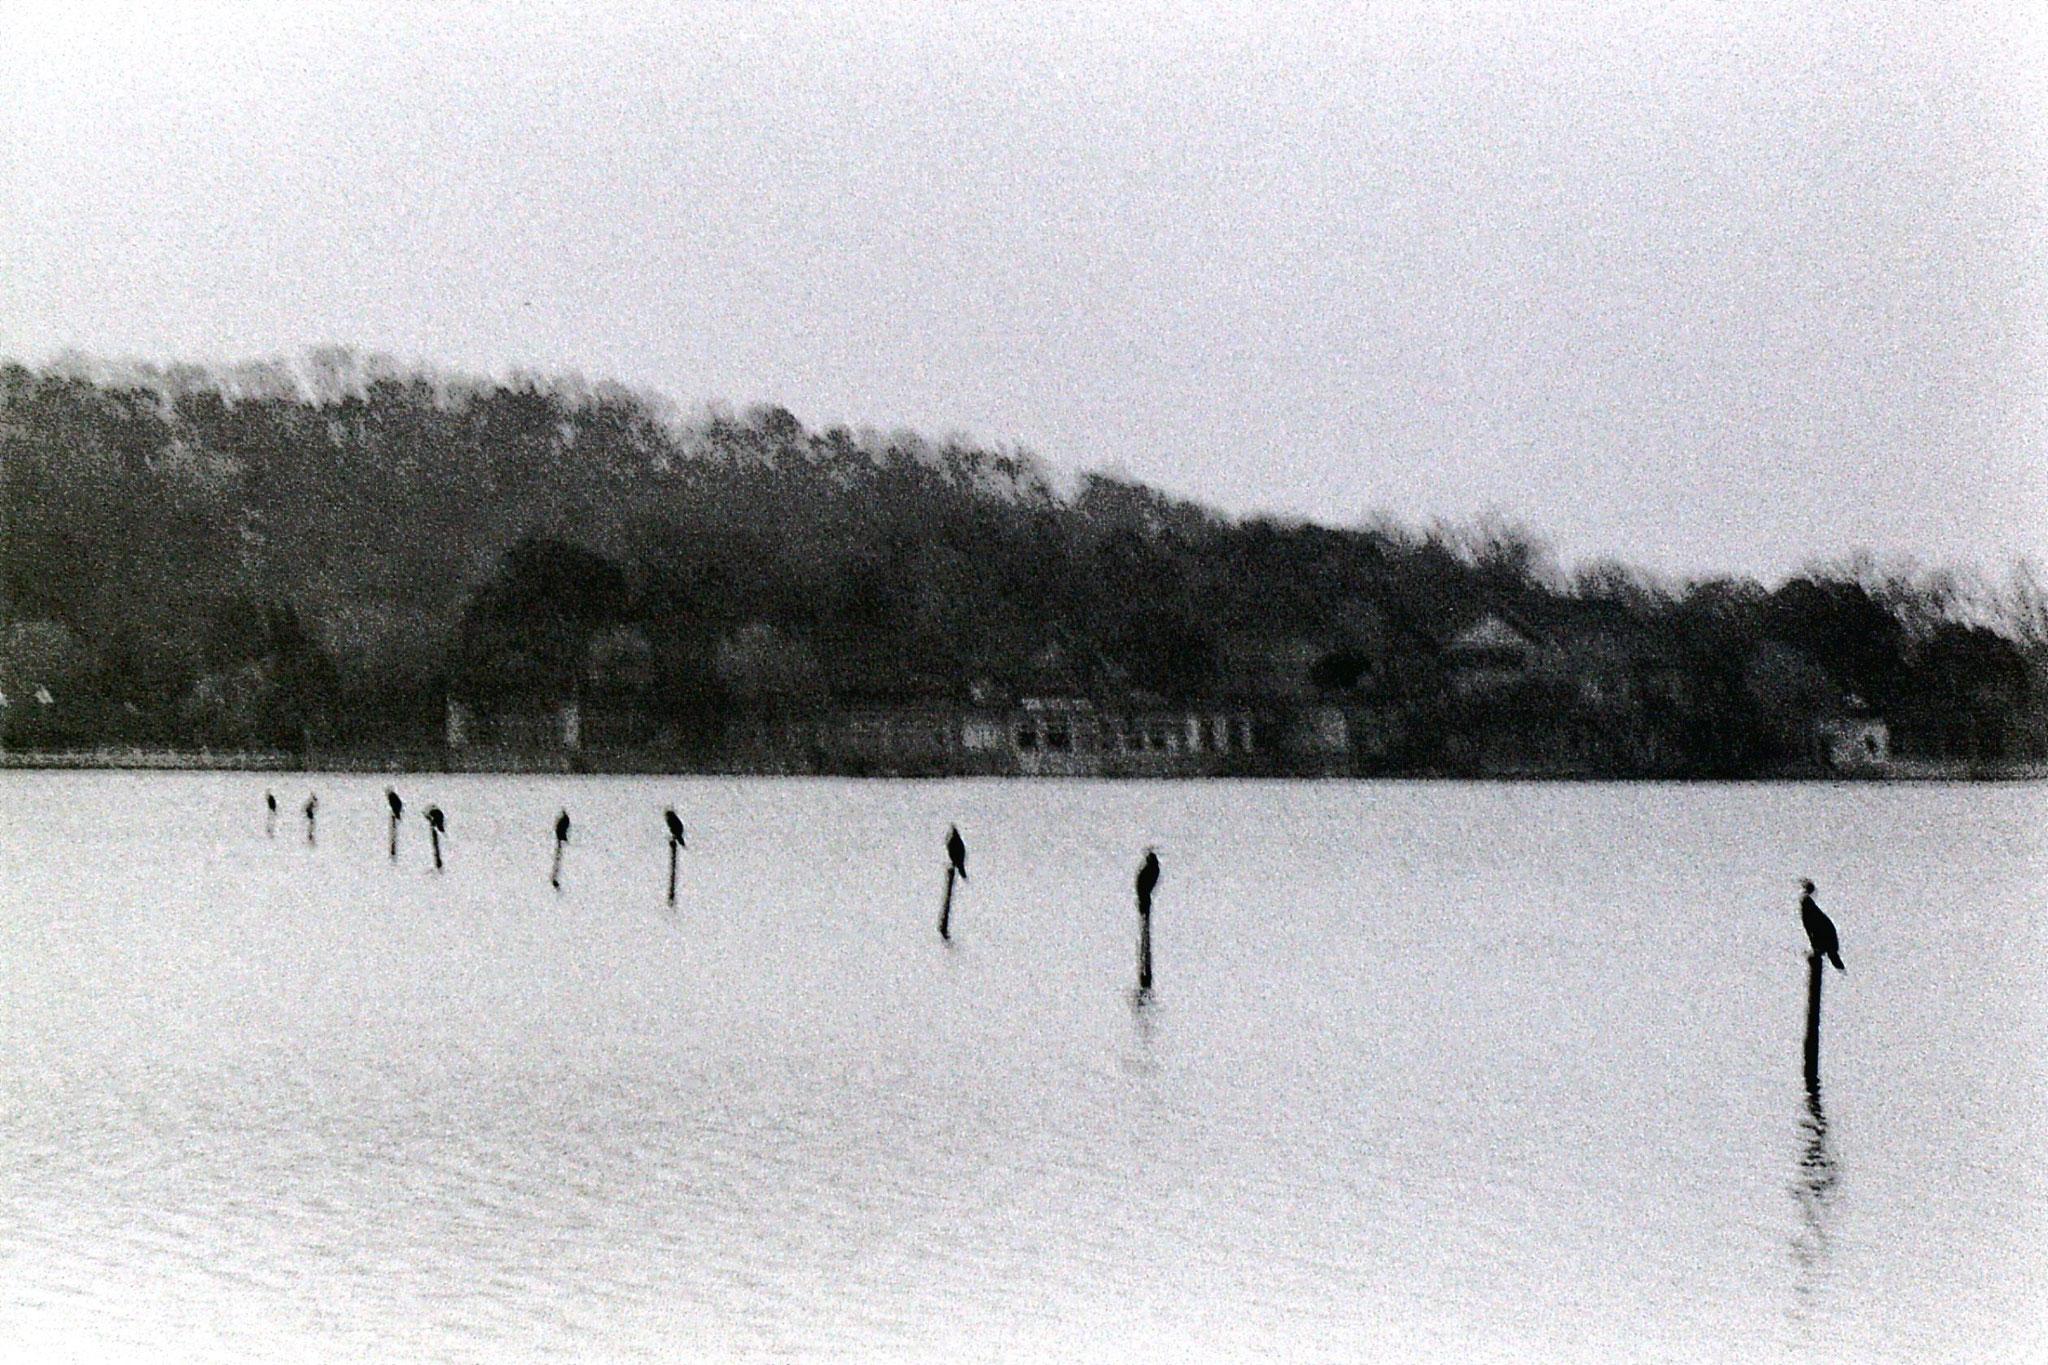 26/3/1989: 2: Hangzhou Huagang Park comorants